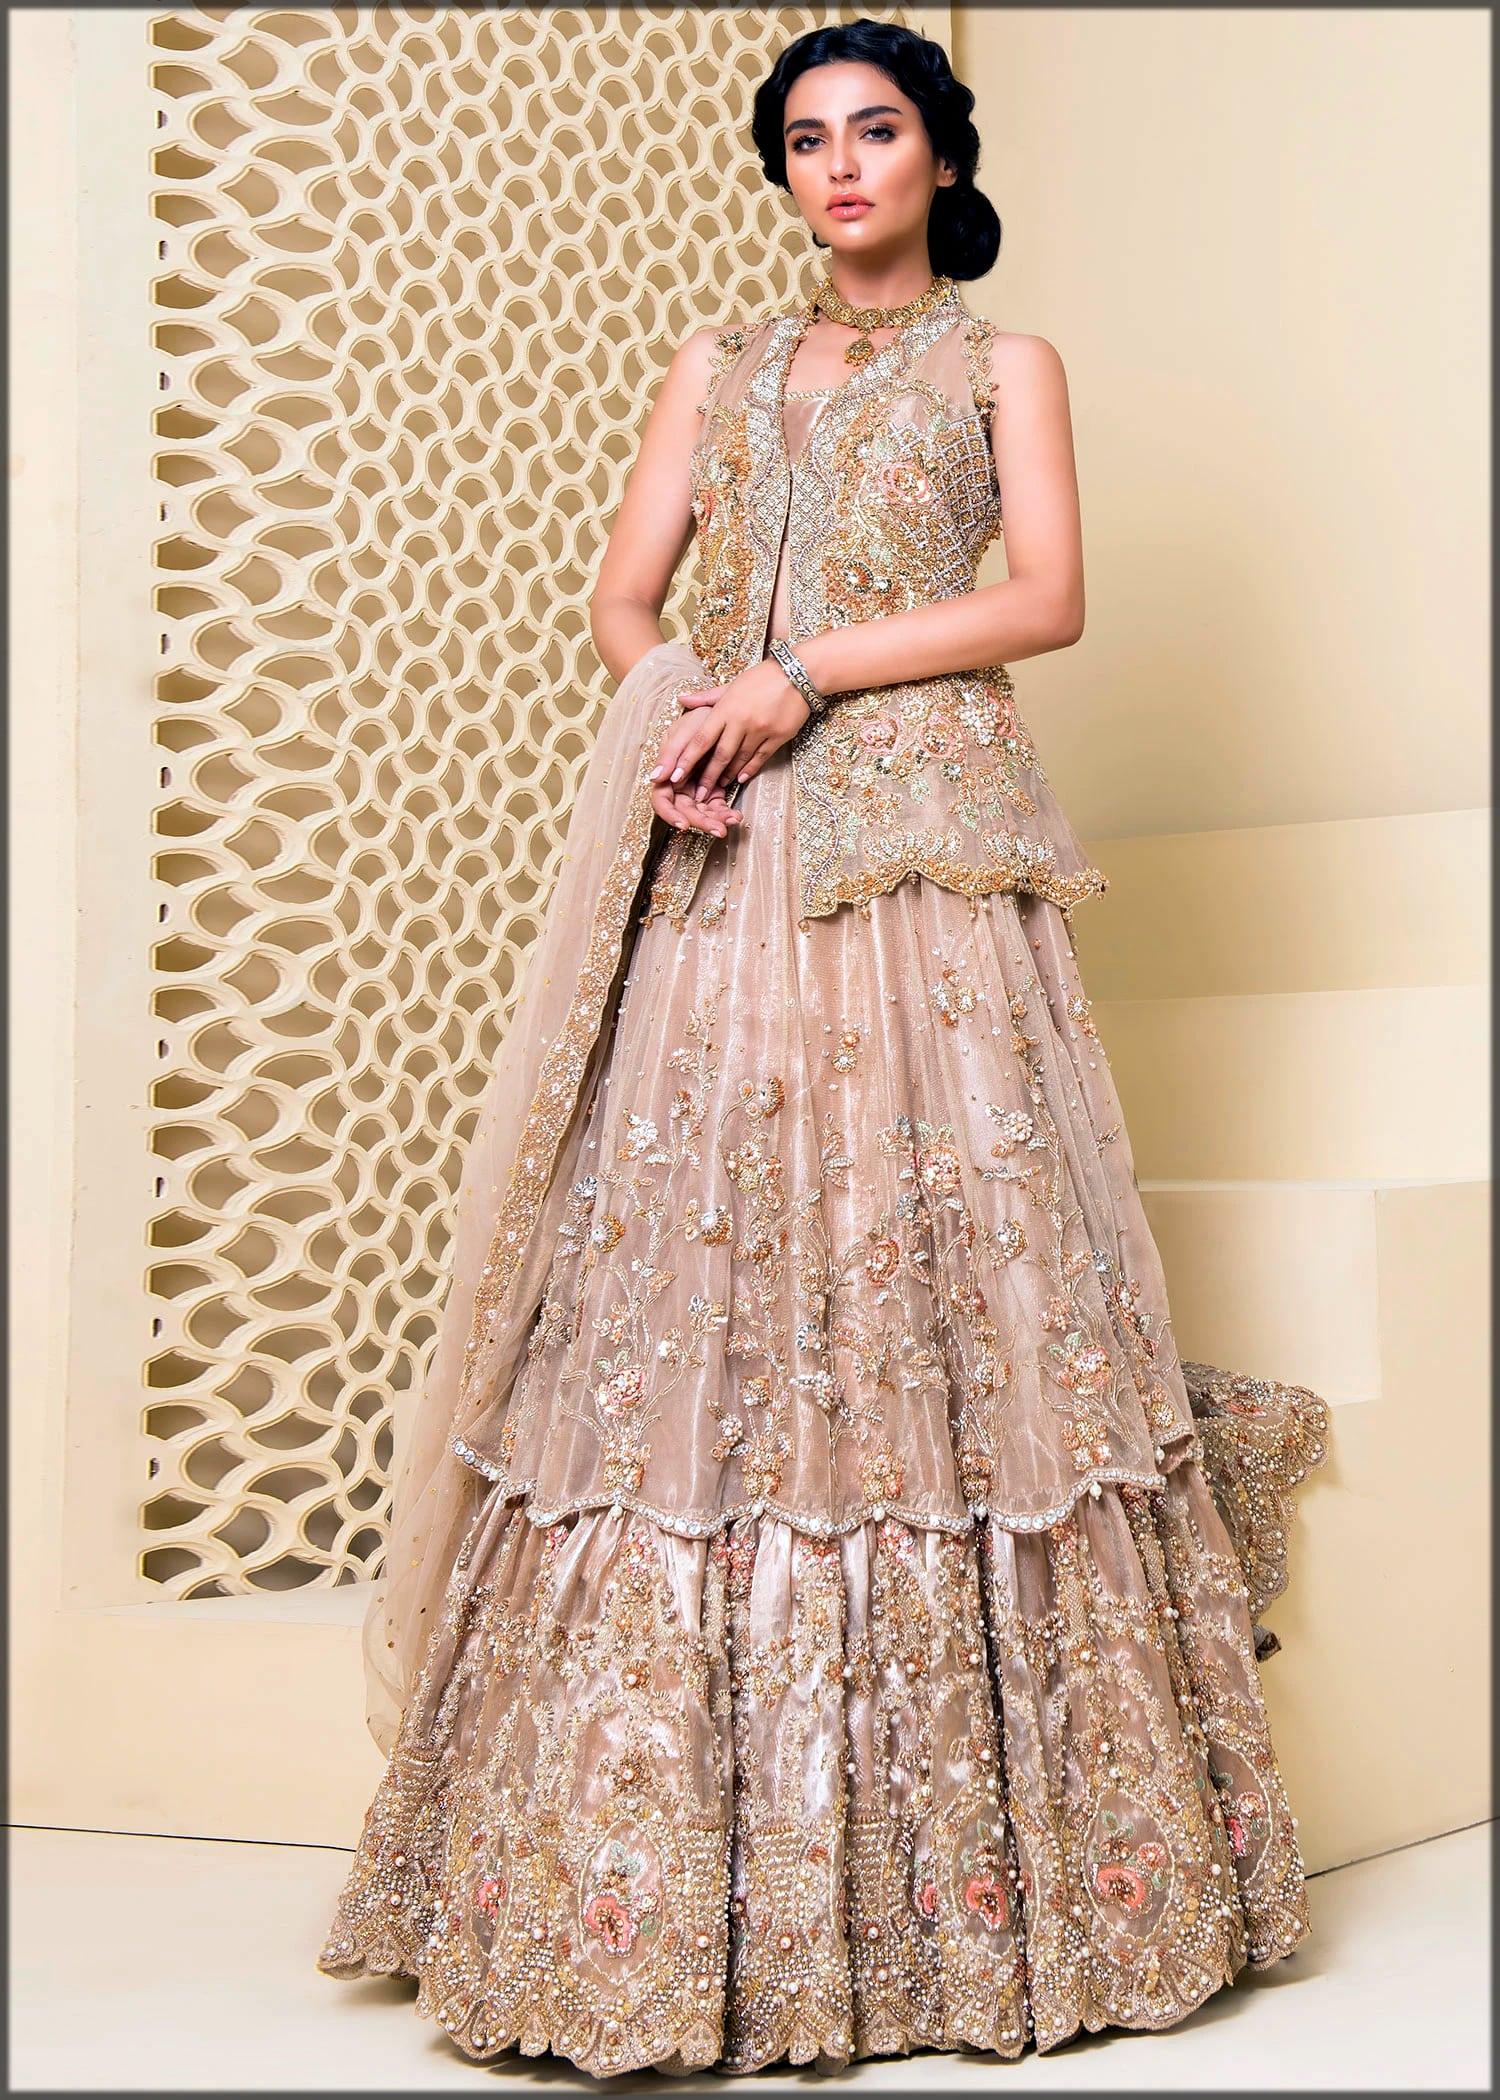 Golden embroidered bridal dress by sadaf fawad khan